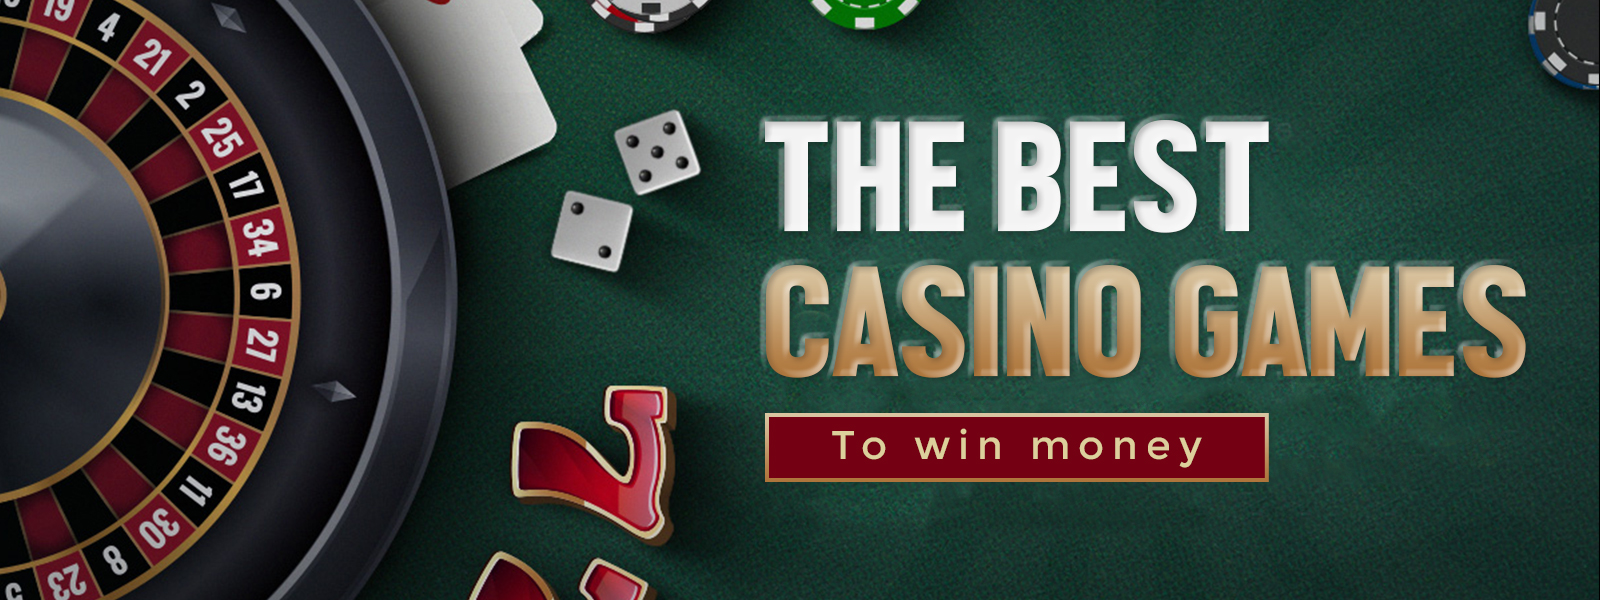 The Best Casino Games To Win Money